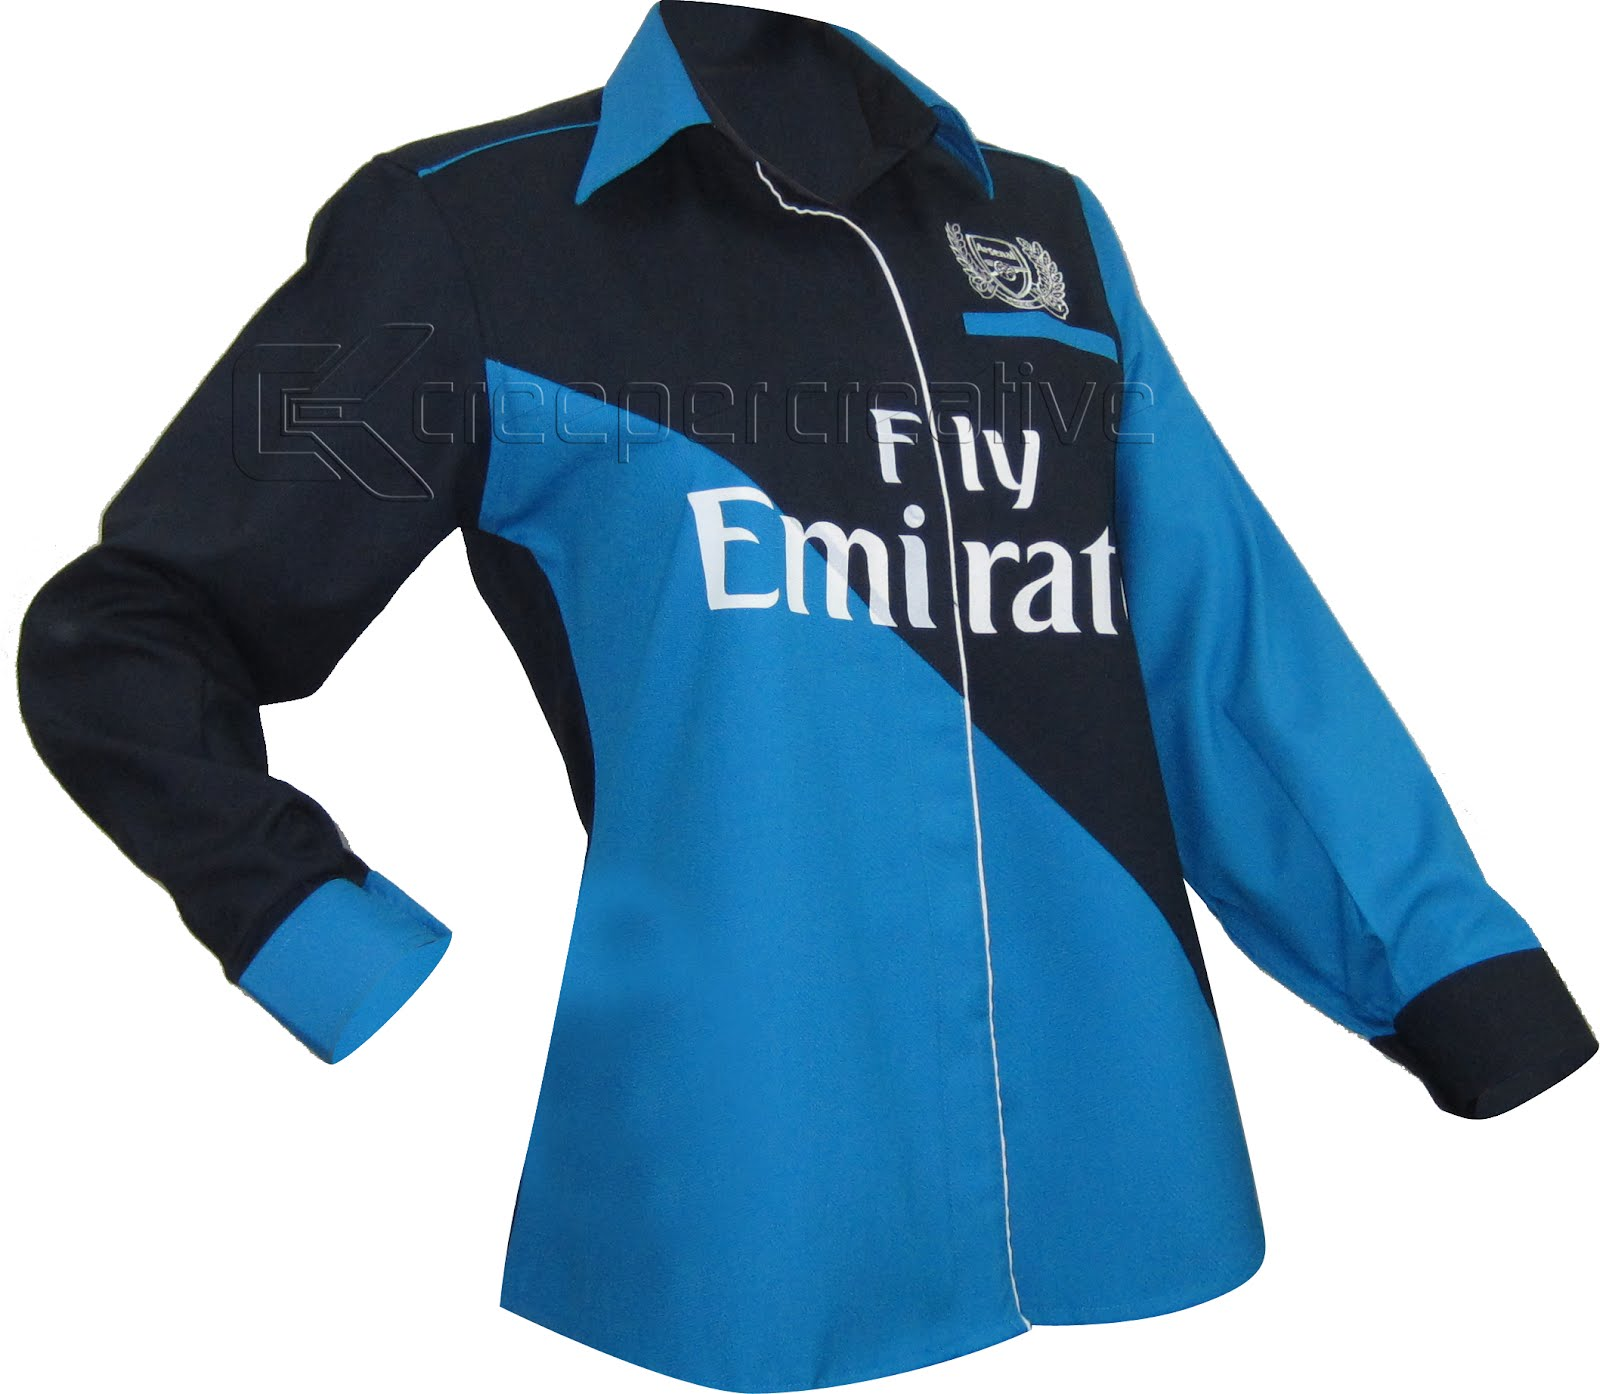 Shirt design malaysia - Corporate Shirt Arsenal Malaysia